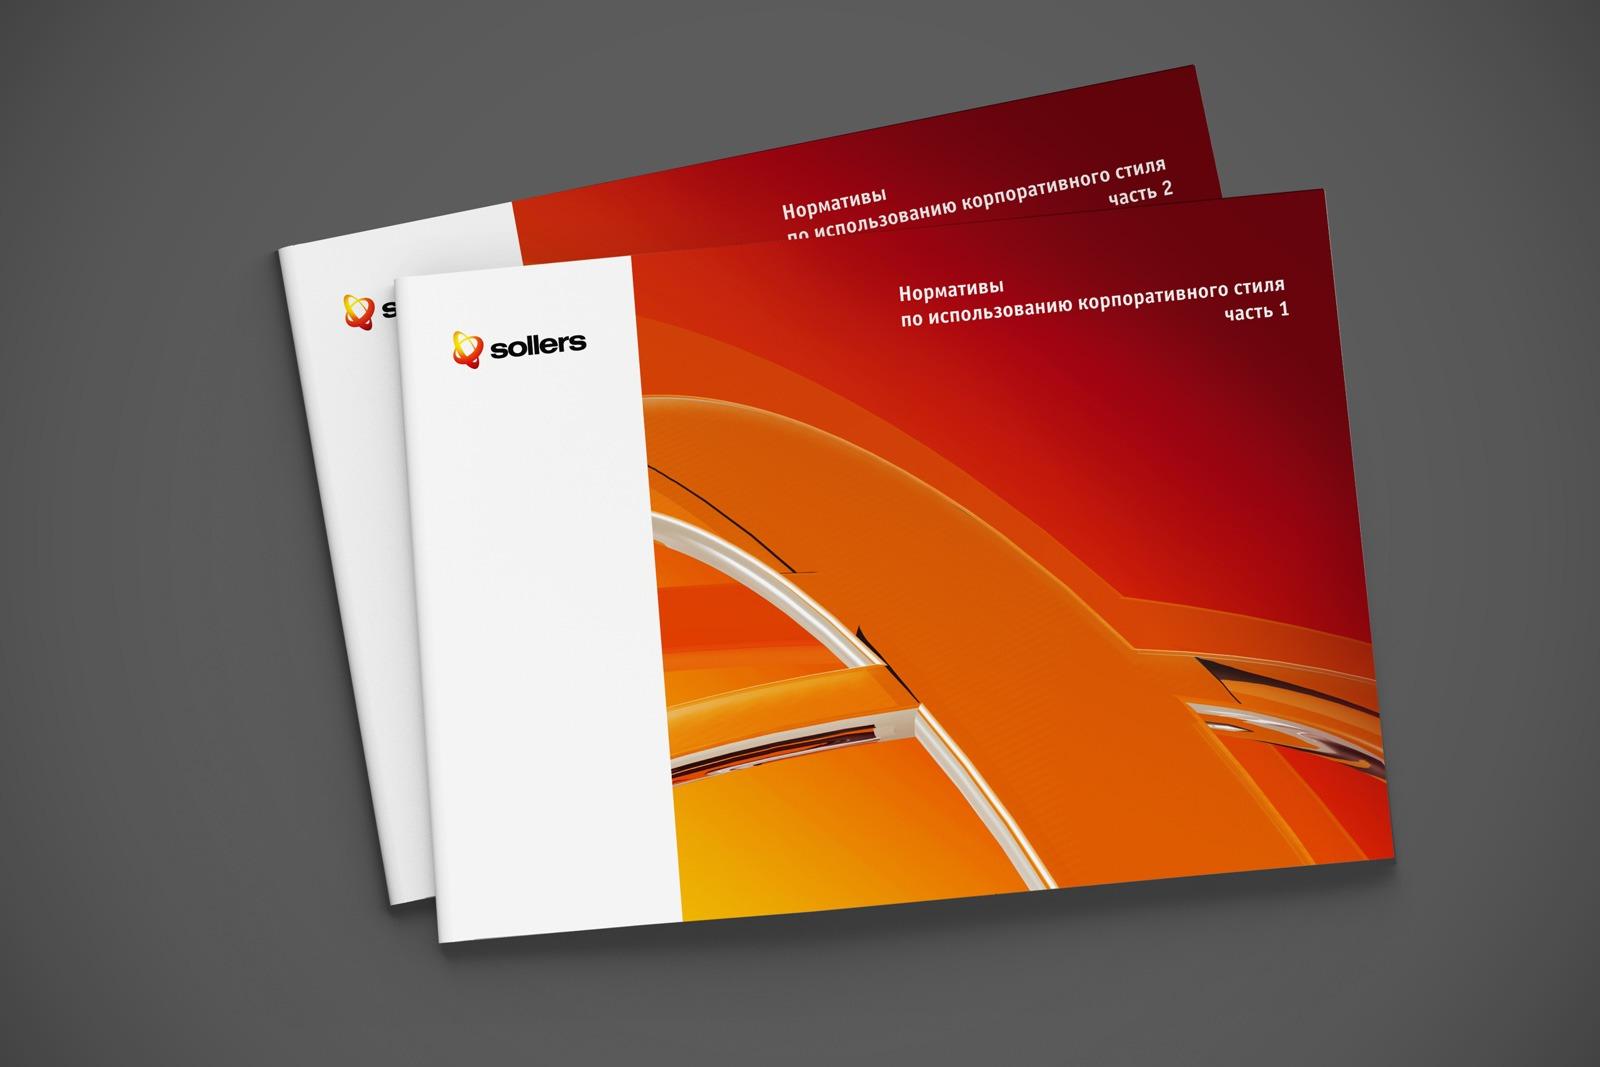 Sollers brandbook, guidelines, brand identity, Asgard